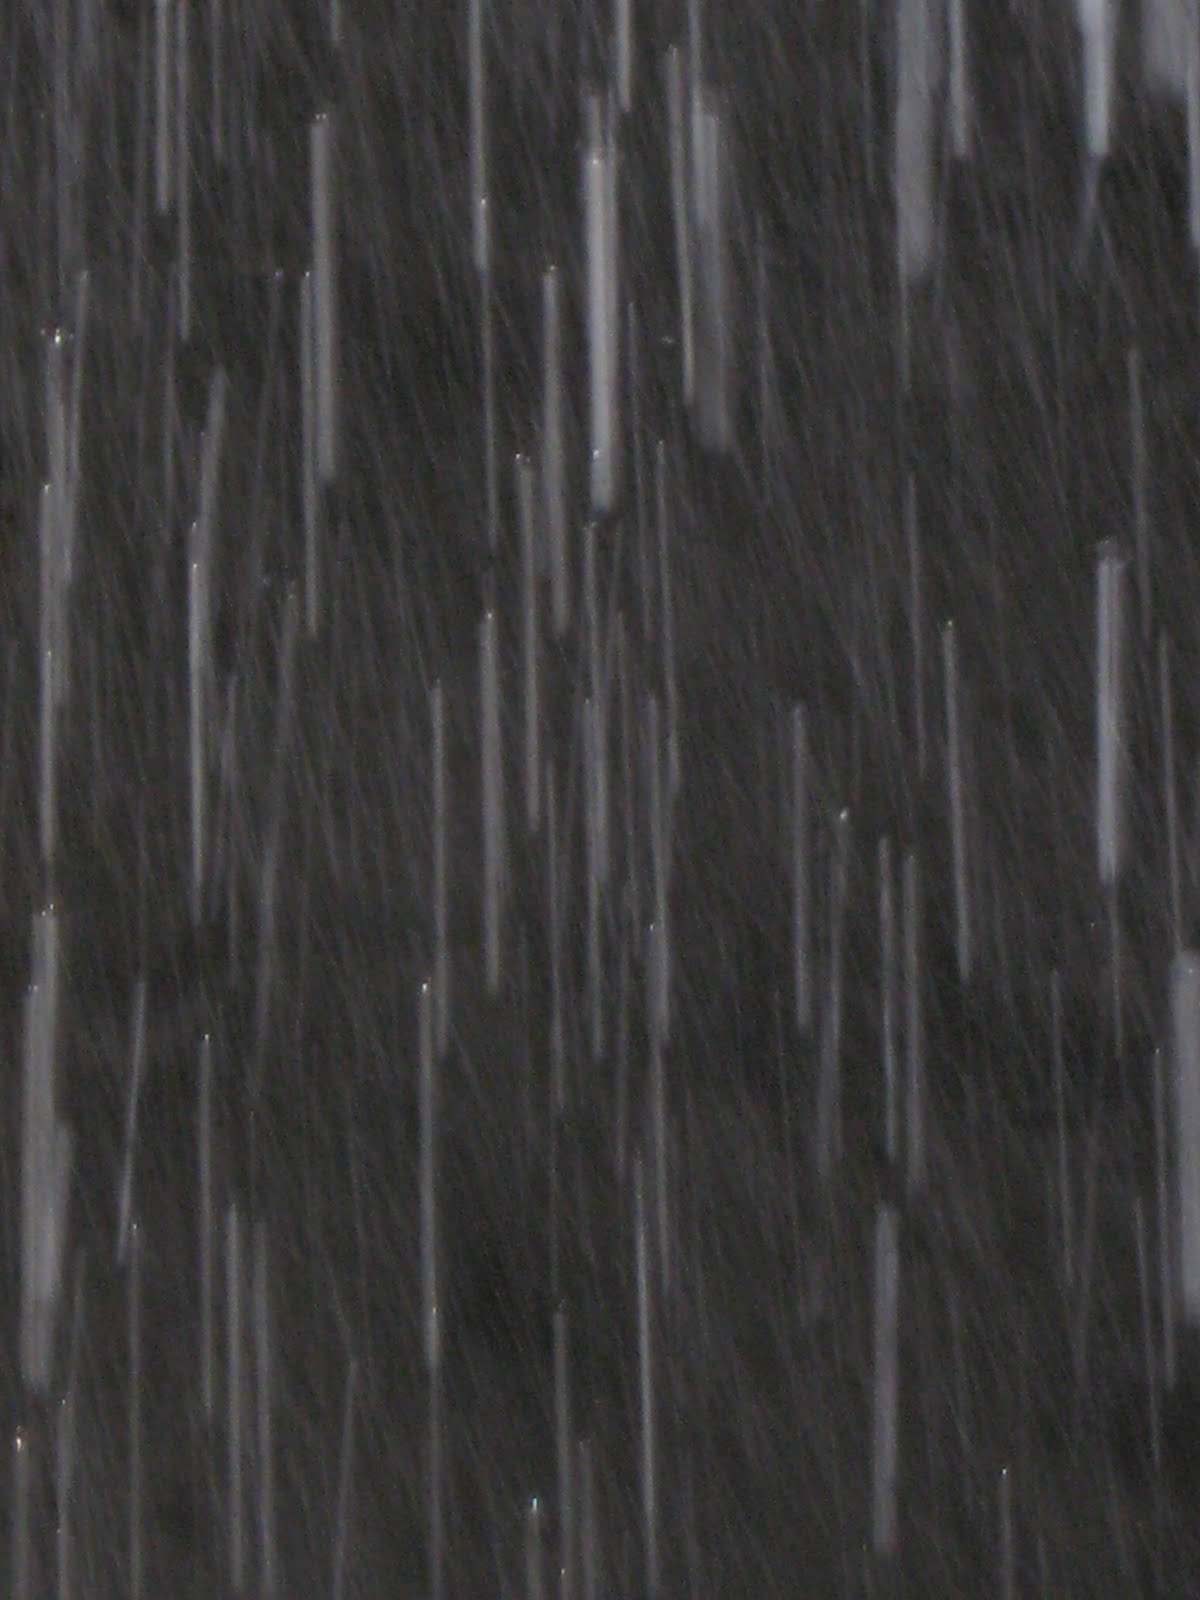 HauteZone: Rain, rain is falling down... falling down all ...